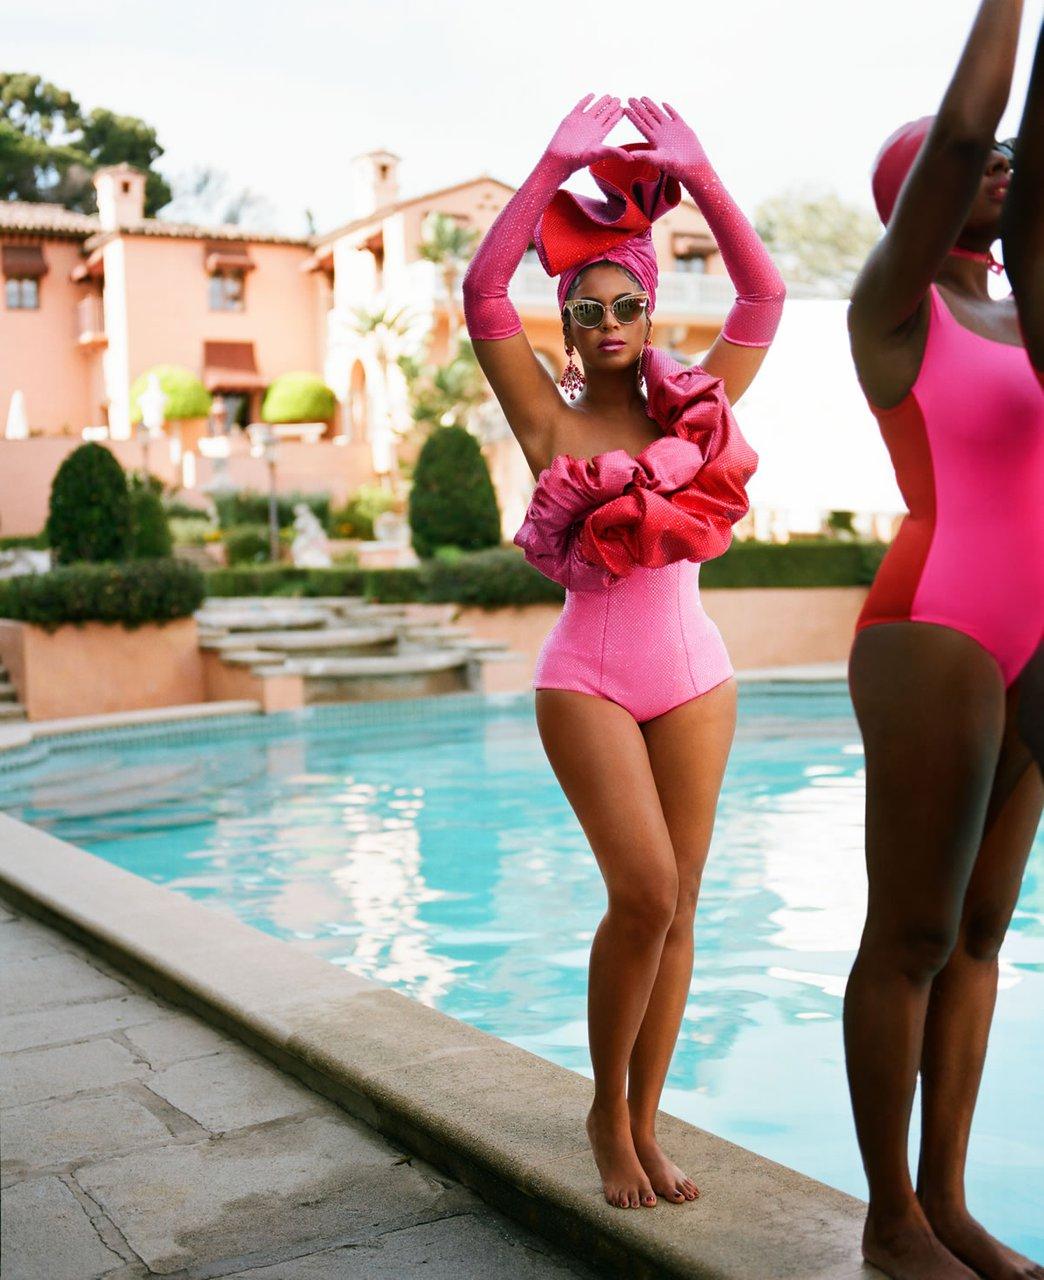 beyonce.com-disney-black-is-king-mood-4-eva-pink-red-solace-london-earrings-anabela-chan-paraiba